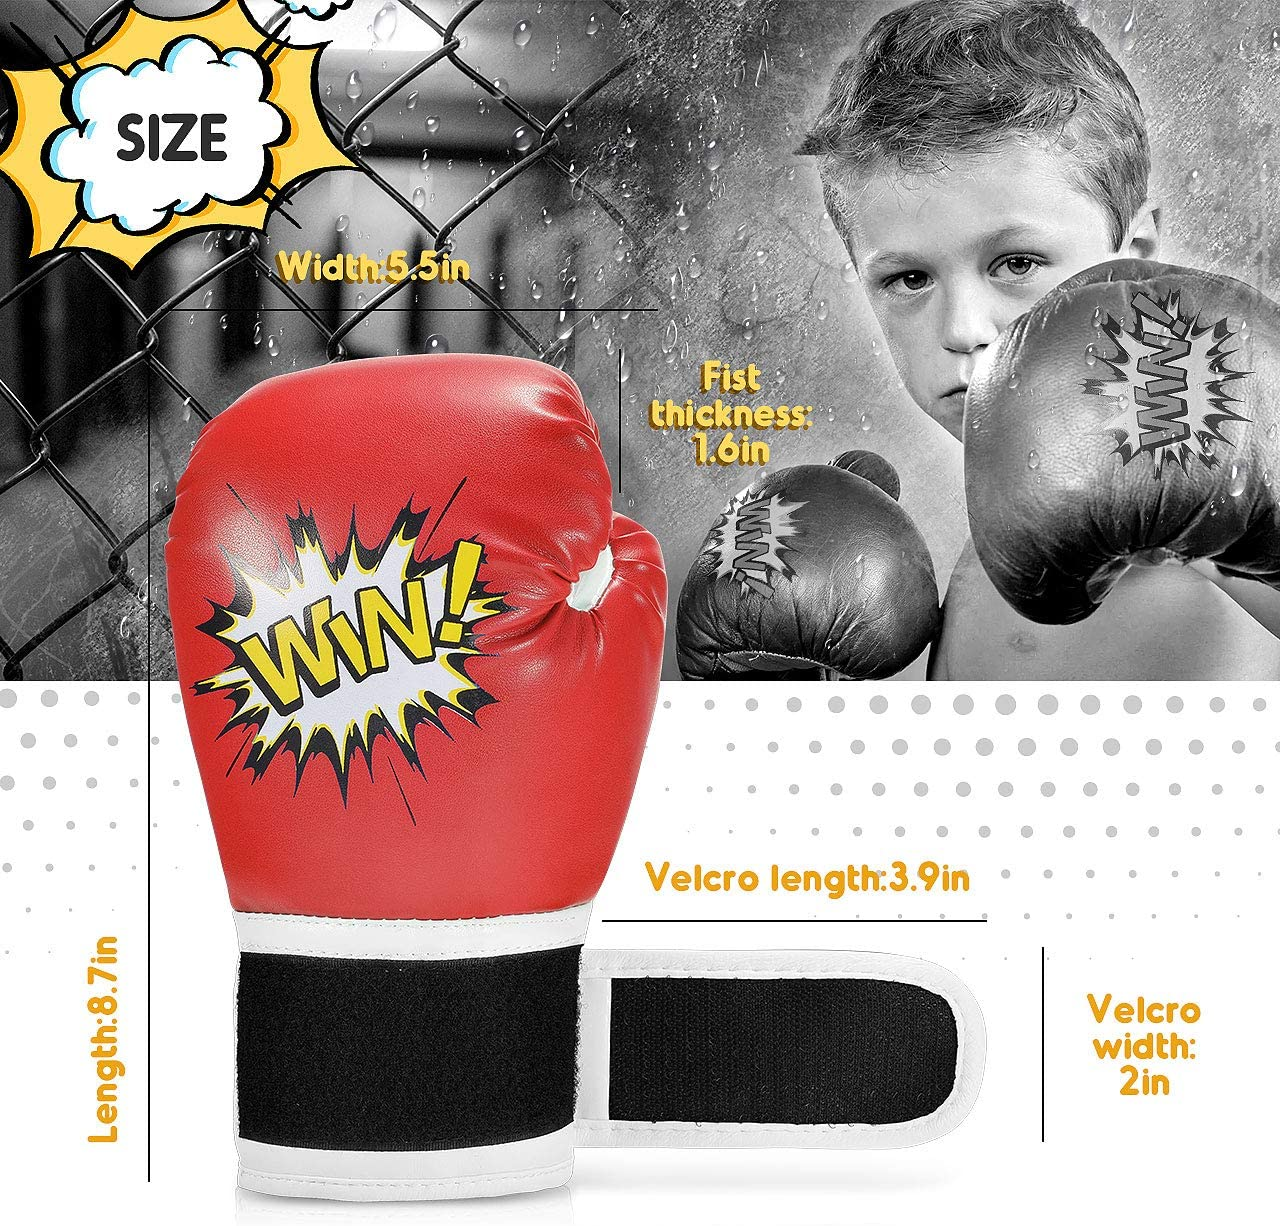 LetsGO toyz Kids Boxing Gloves Best Gifts /& Toy